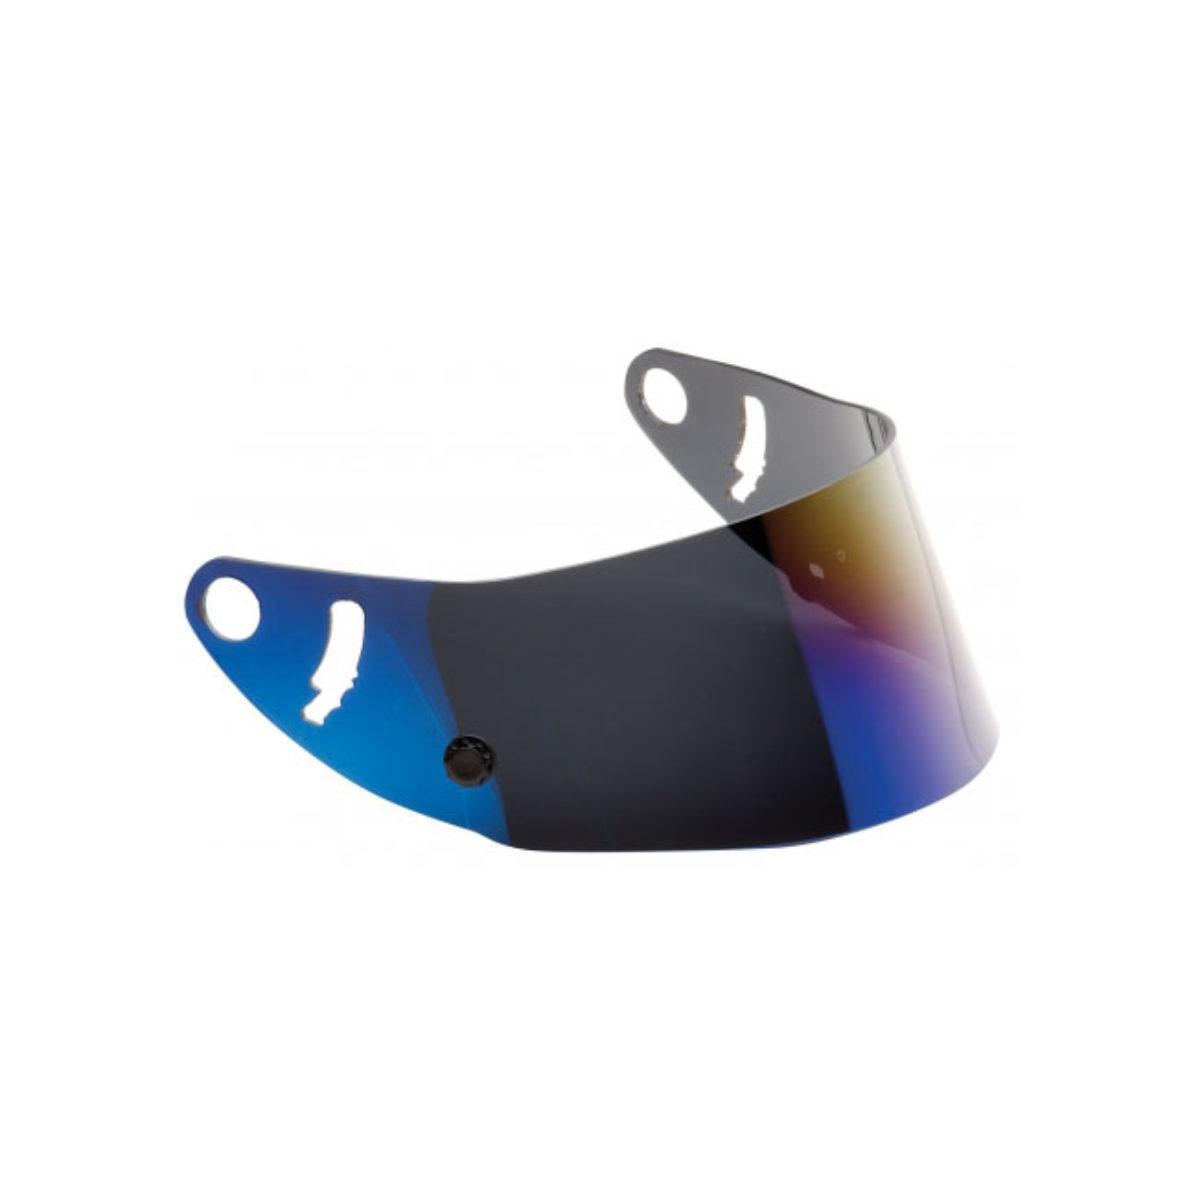 IRIDIUM BLUE VISOR FOR GP8 EVO HELMETS